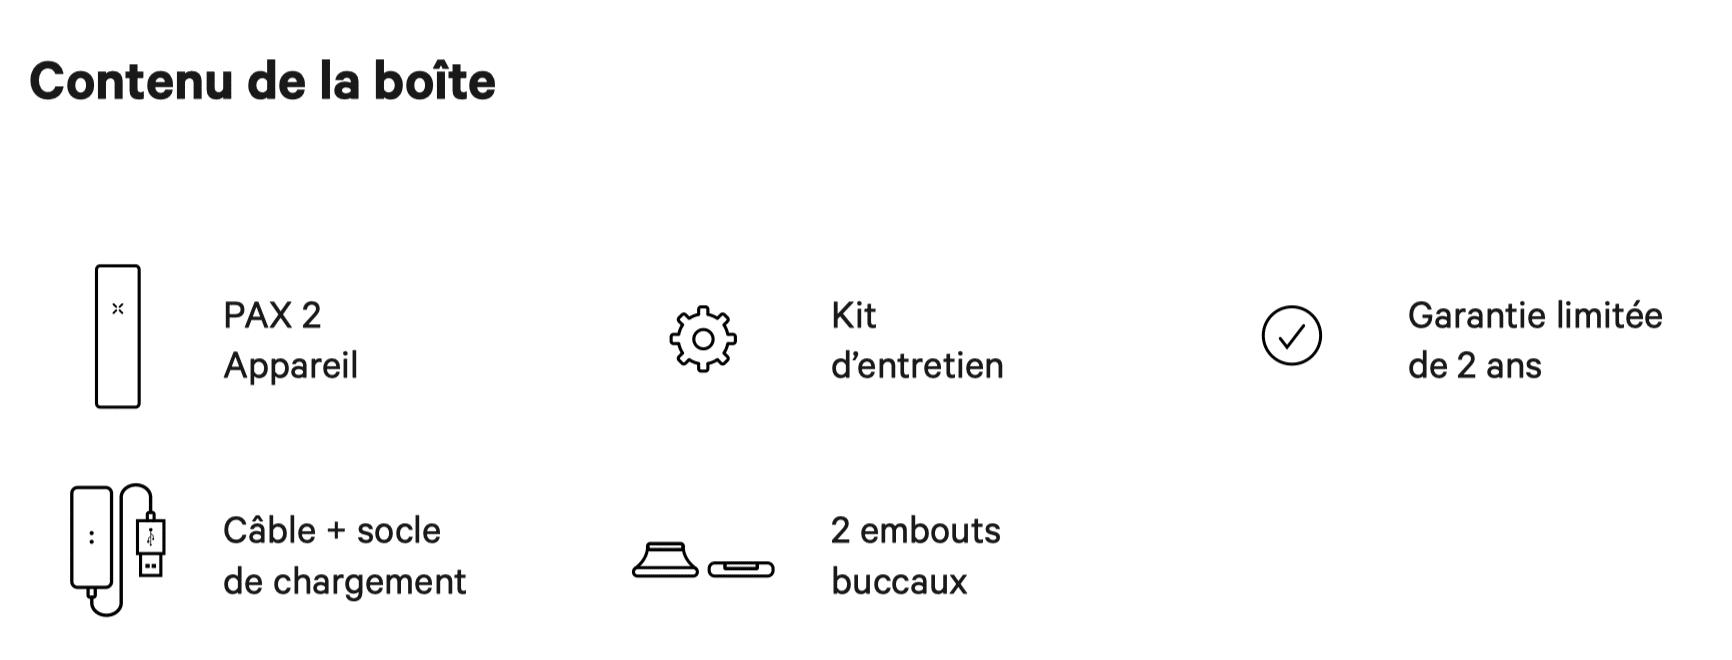 Contenu boite vaporisateur Pax 2